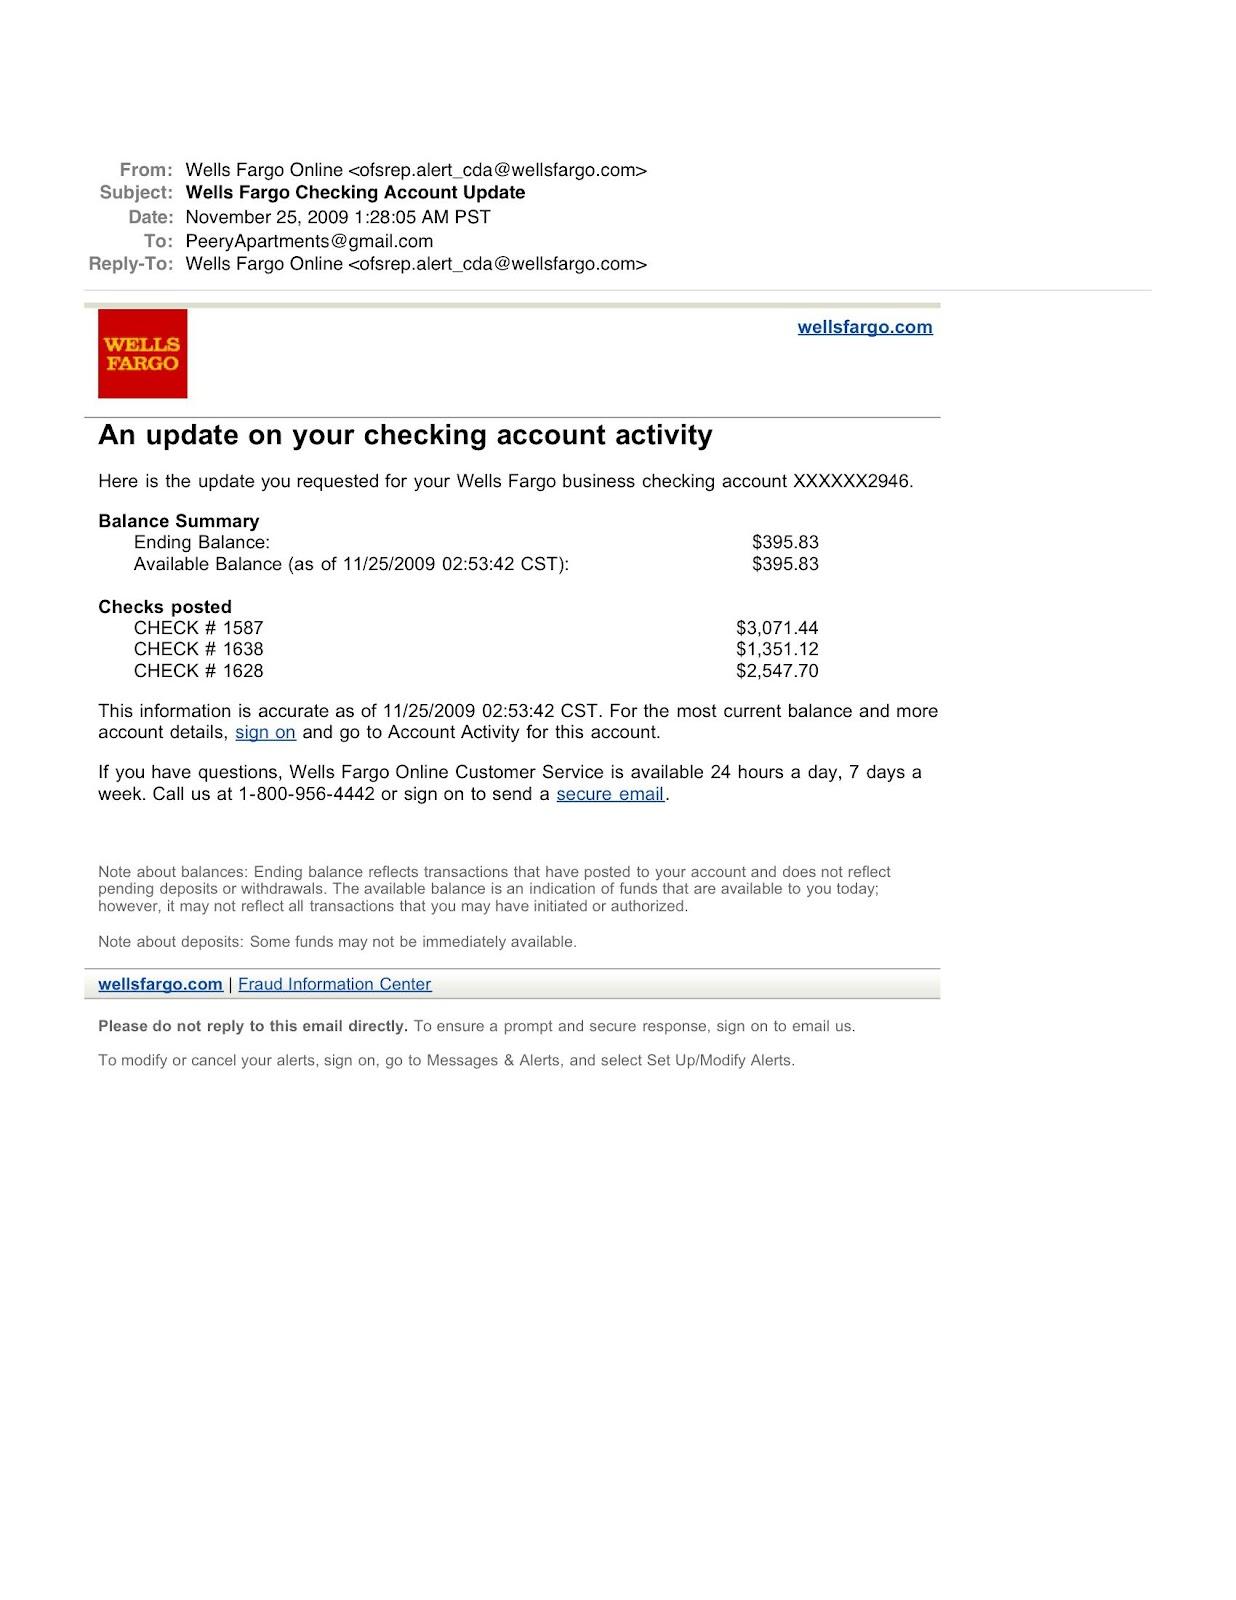 Wells fargo bank verification : What is a gibraltar